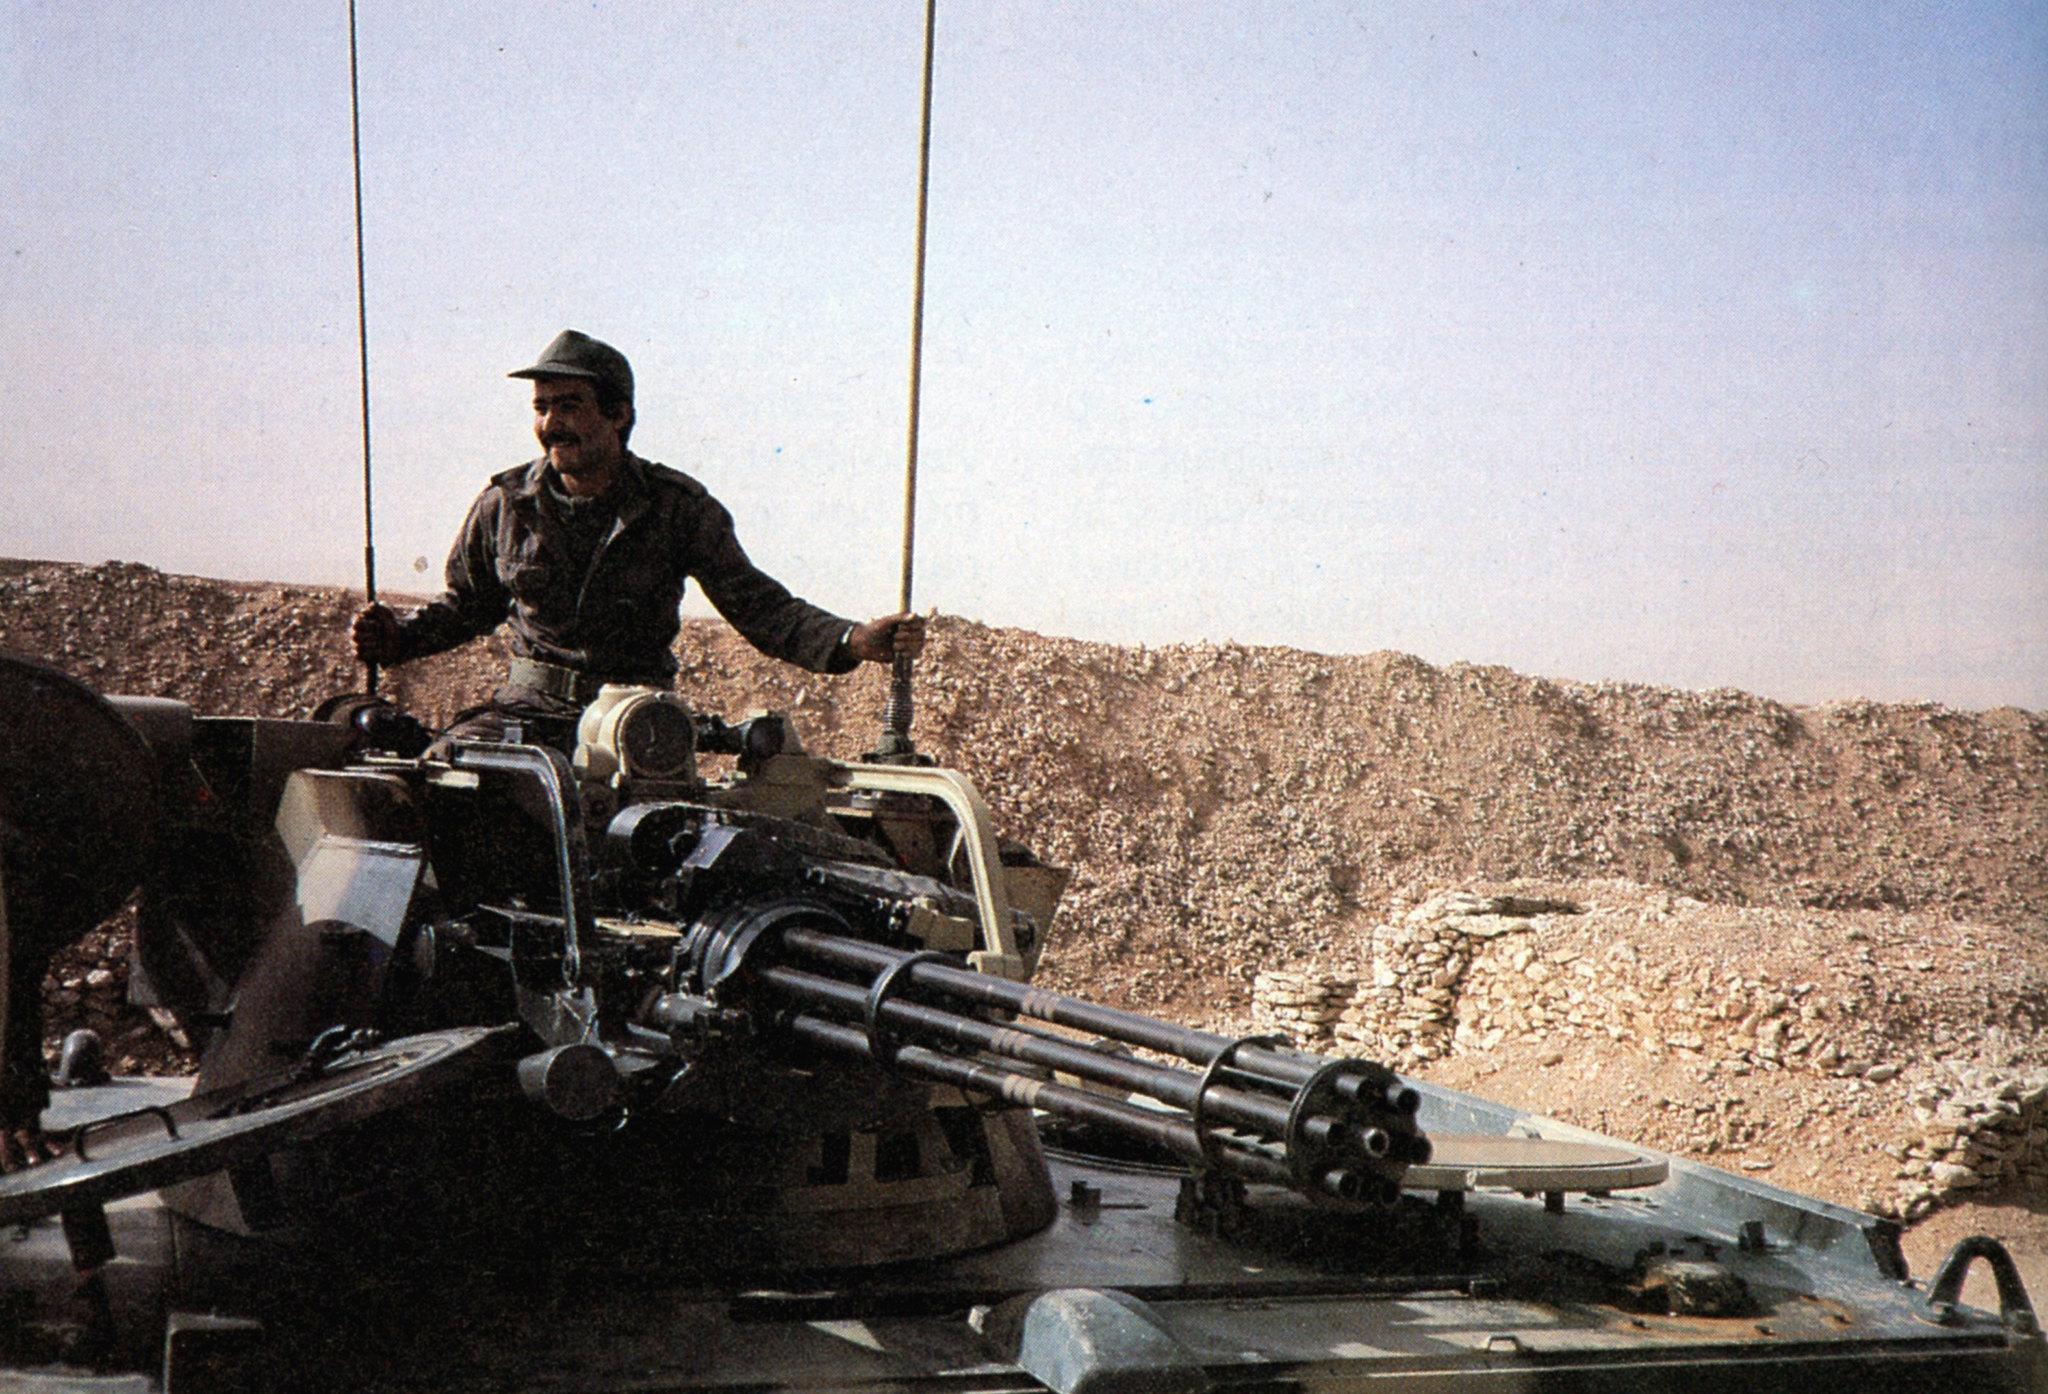 Le conflit armé du sahara marocain - Page 16 51222796302_b21f9dc13e_k_d